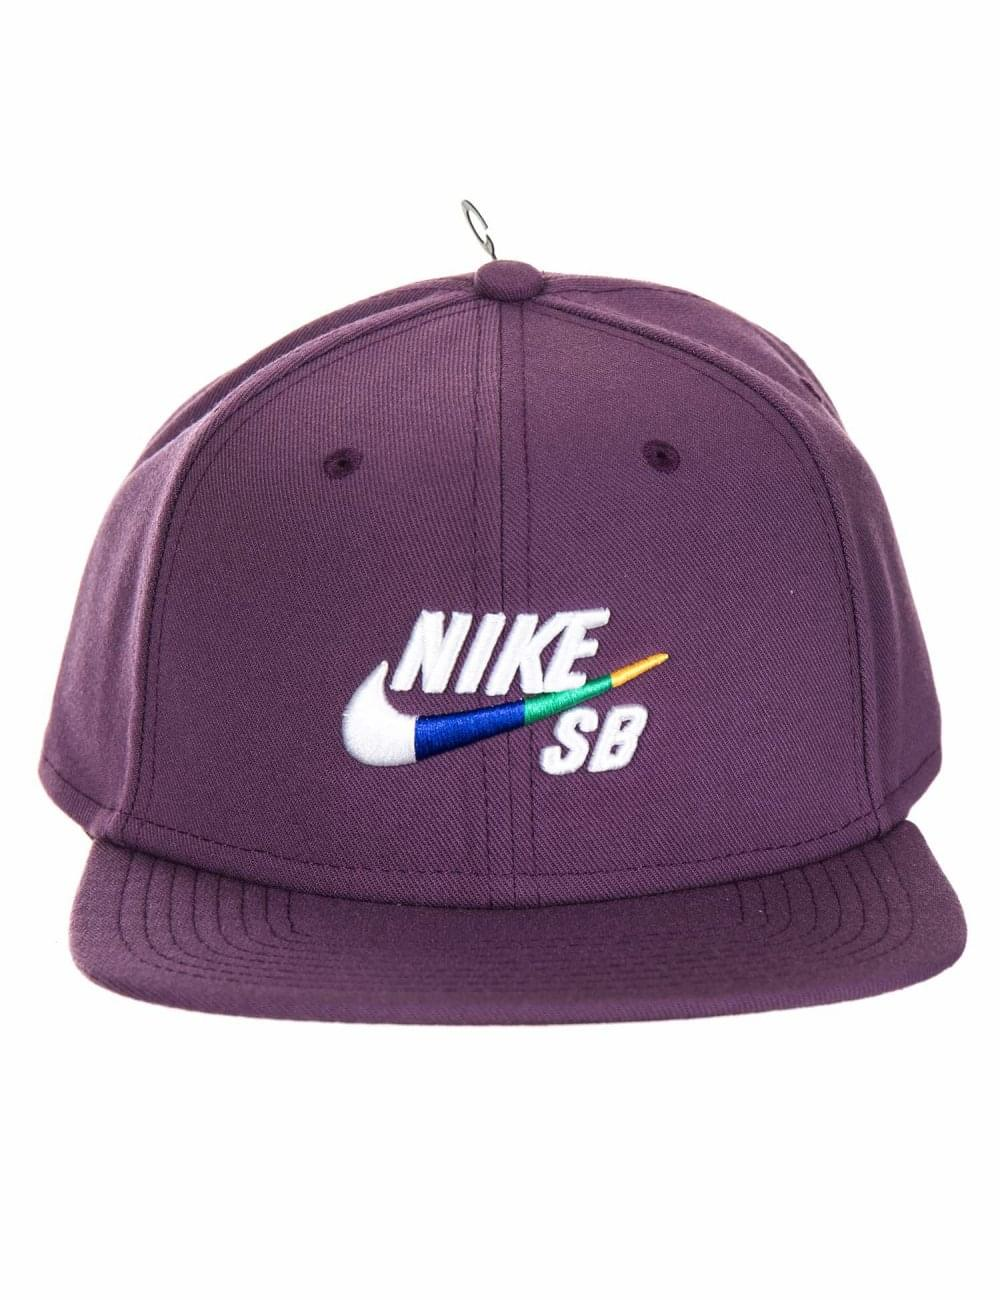 47dad08130d0 Nike SB Icon Pro Snapback Hat - Pro Purple - Hat Shop from Fat ...